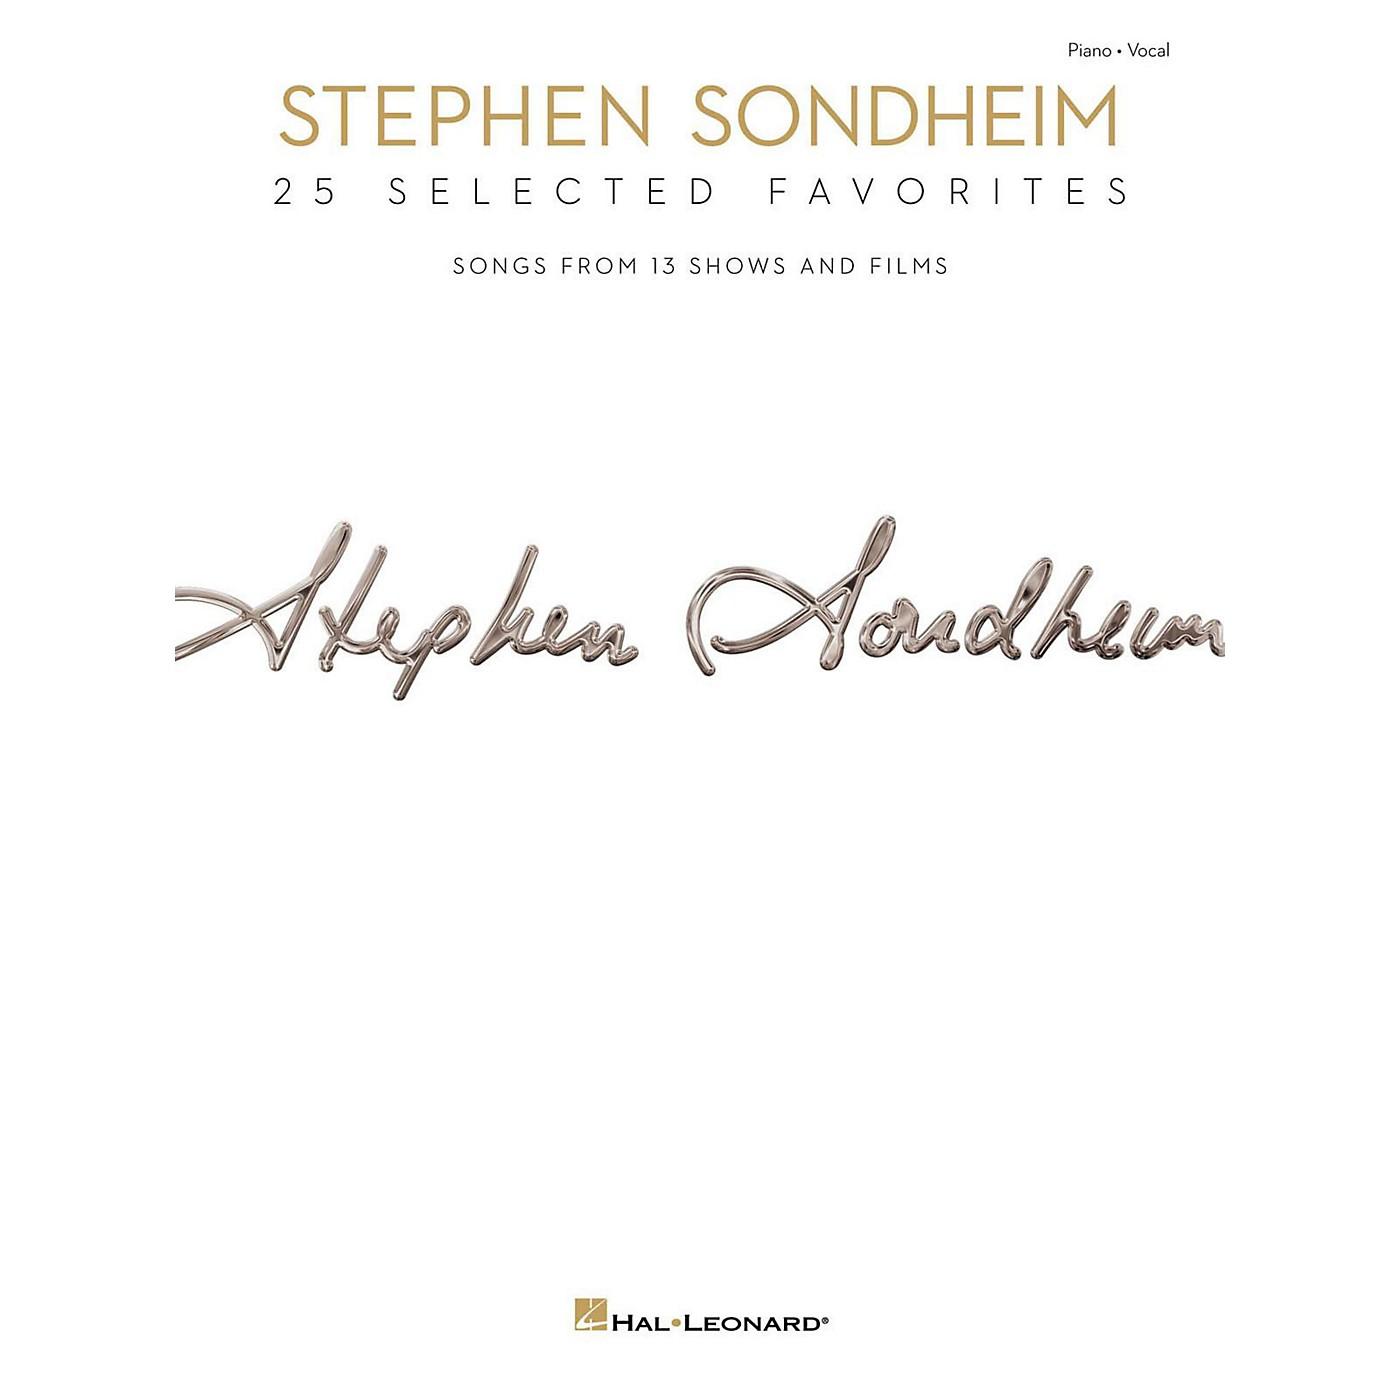 Hal Leonard Stephen Sondheim - 25 Selected Favorites for Piano/Vocal/Guitar thumbnail